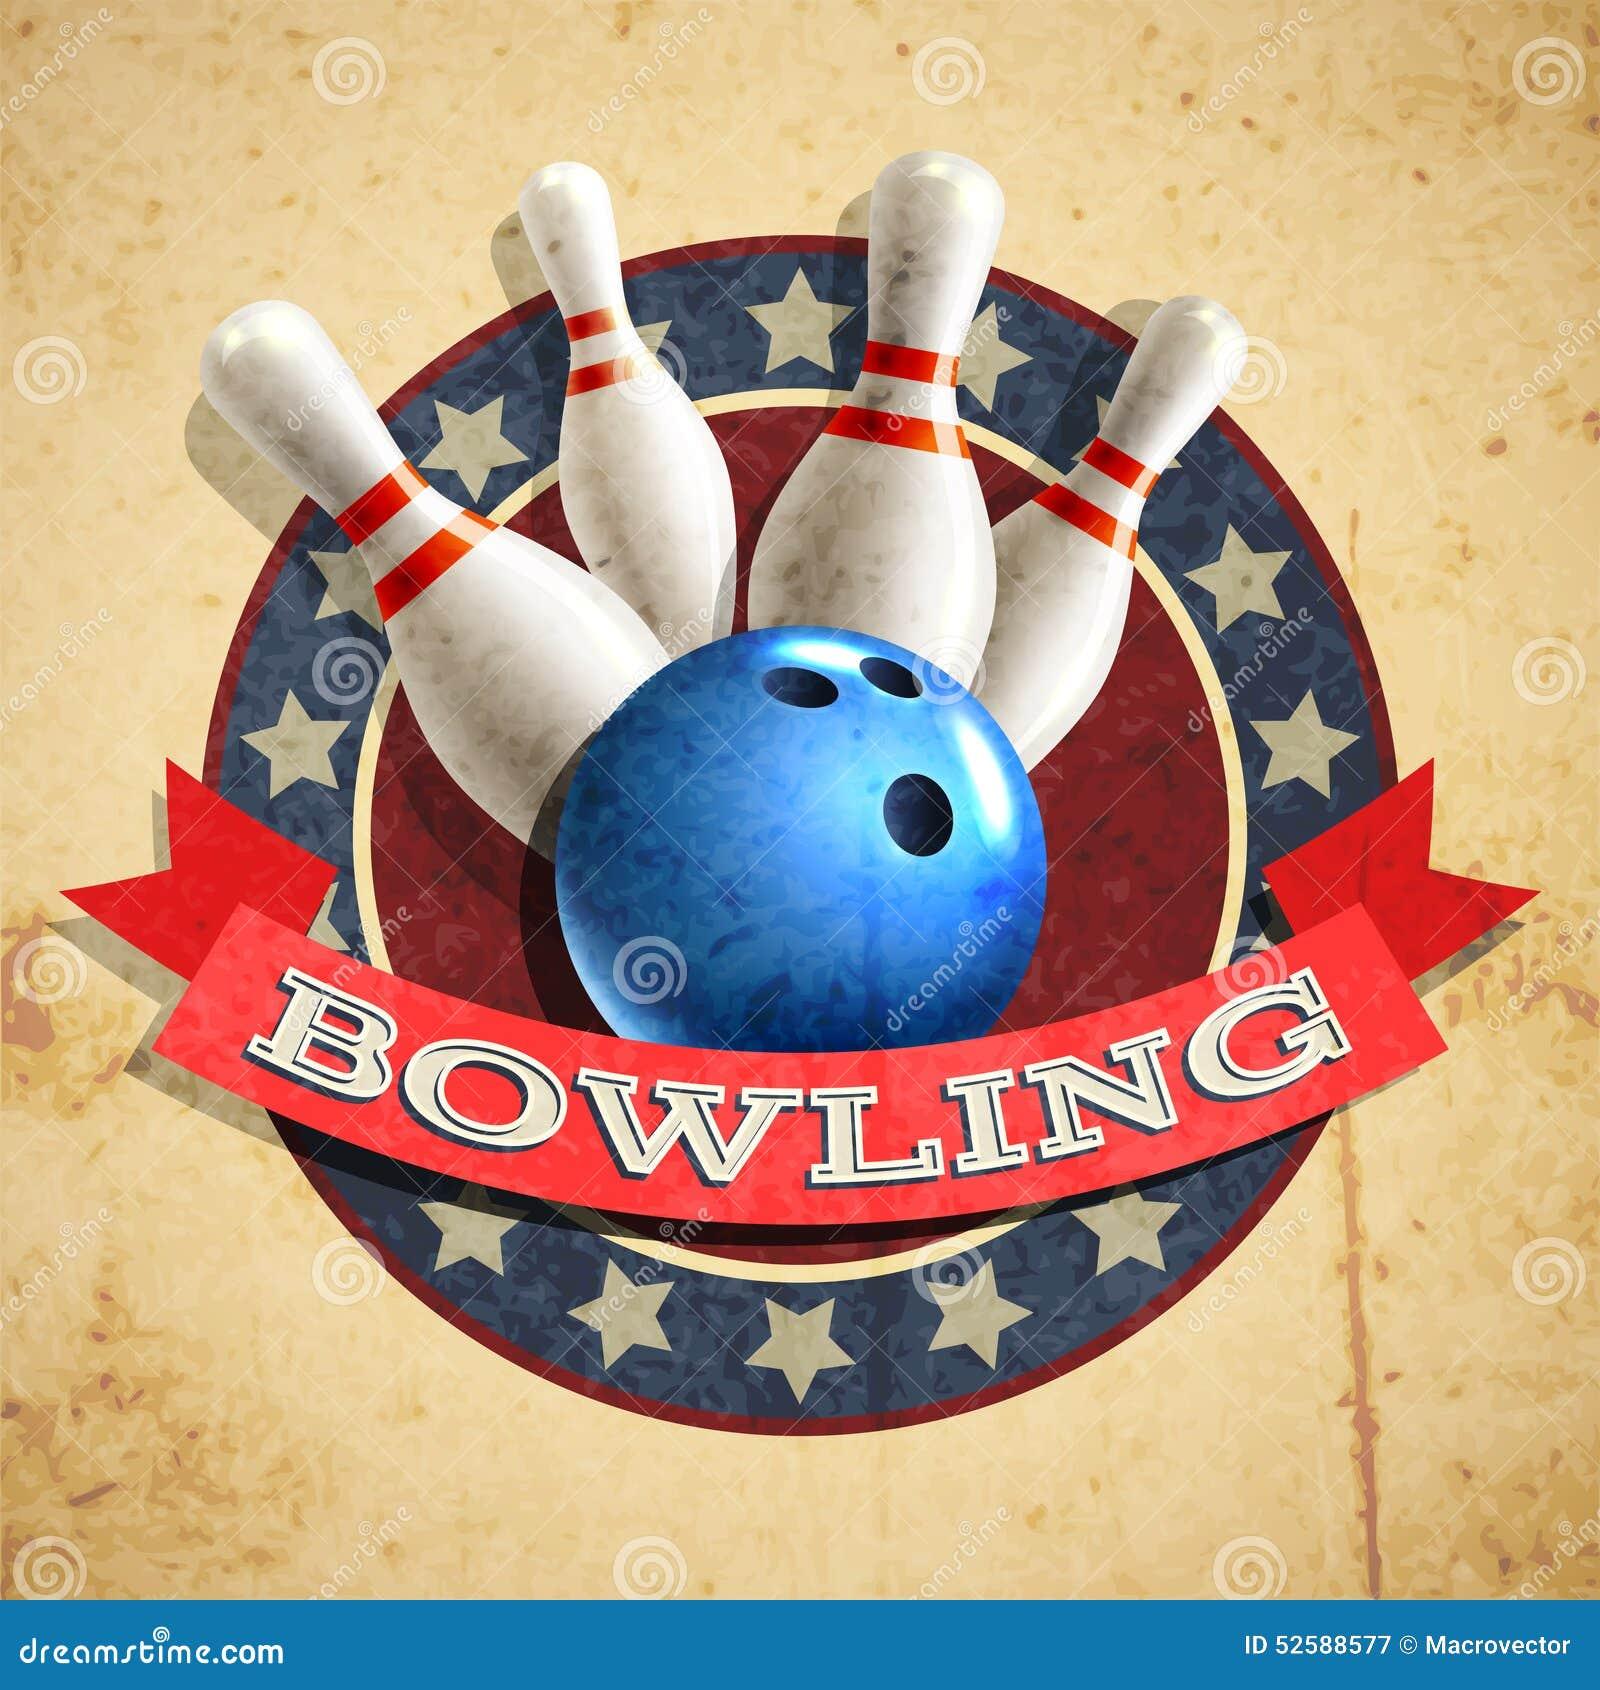 Bowling Emblem Background Stock Vector Image 52588577